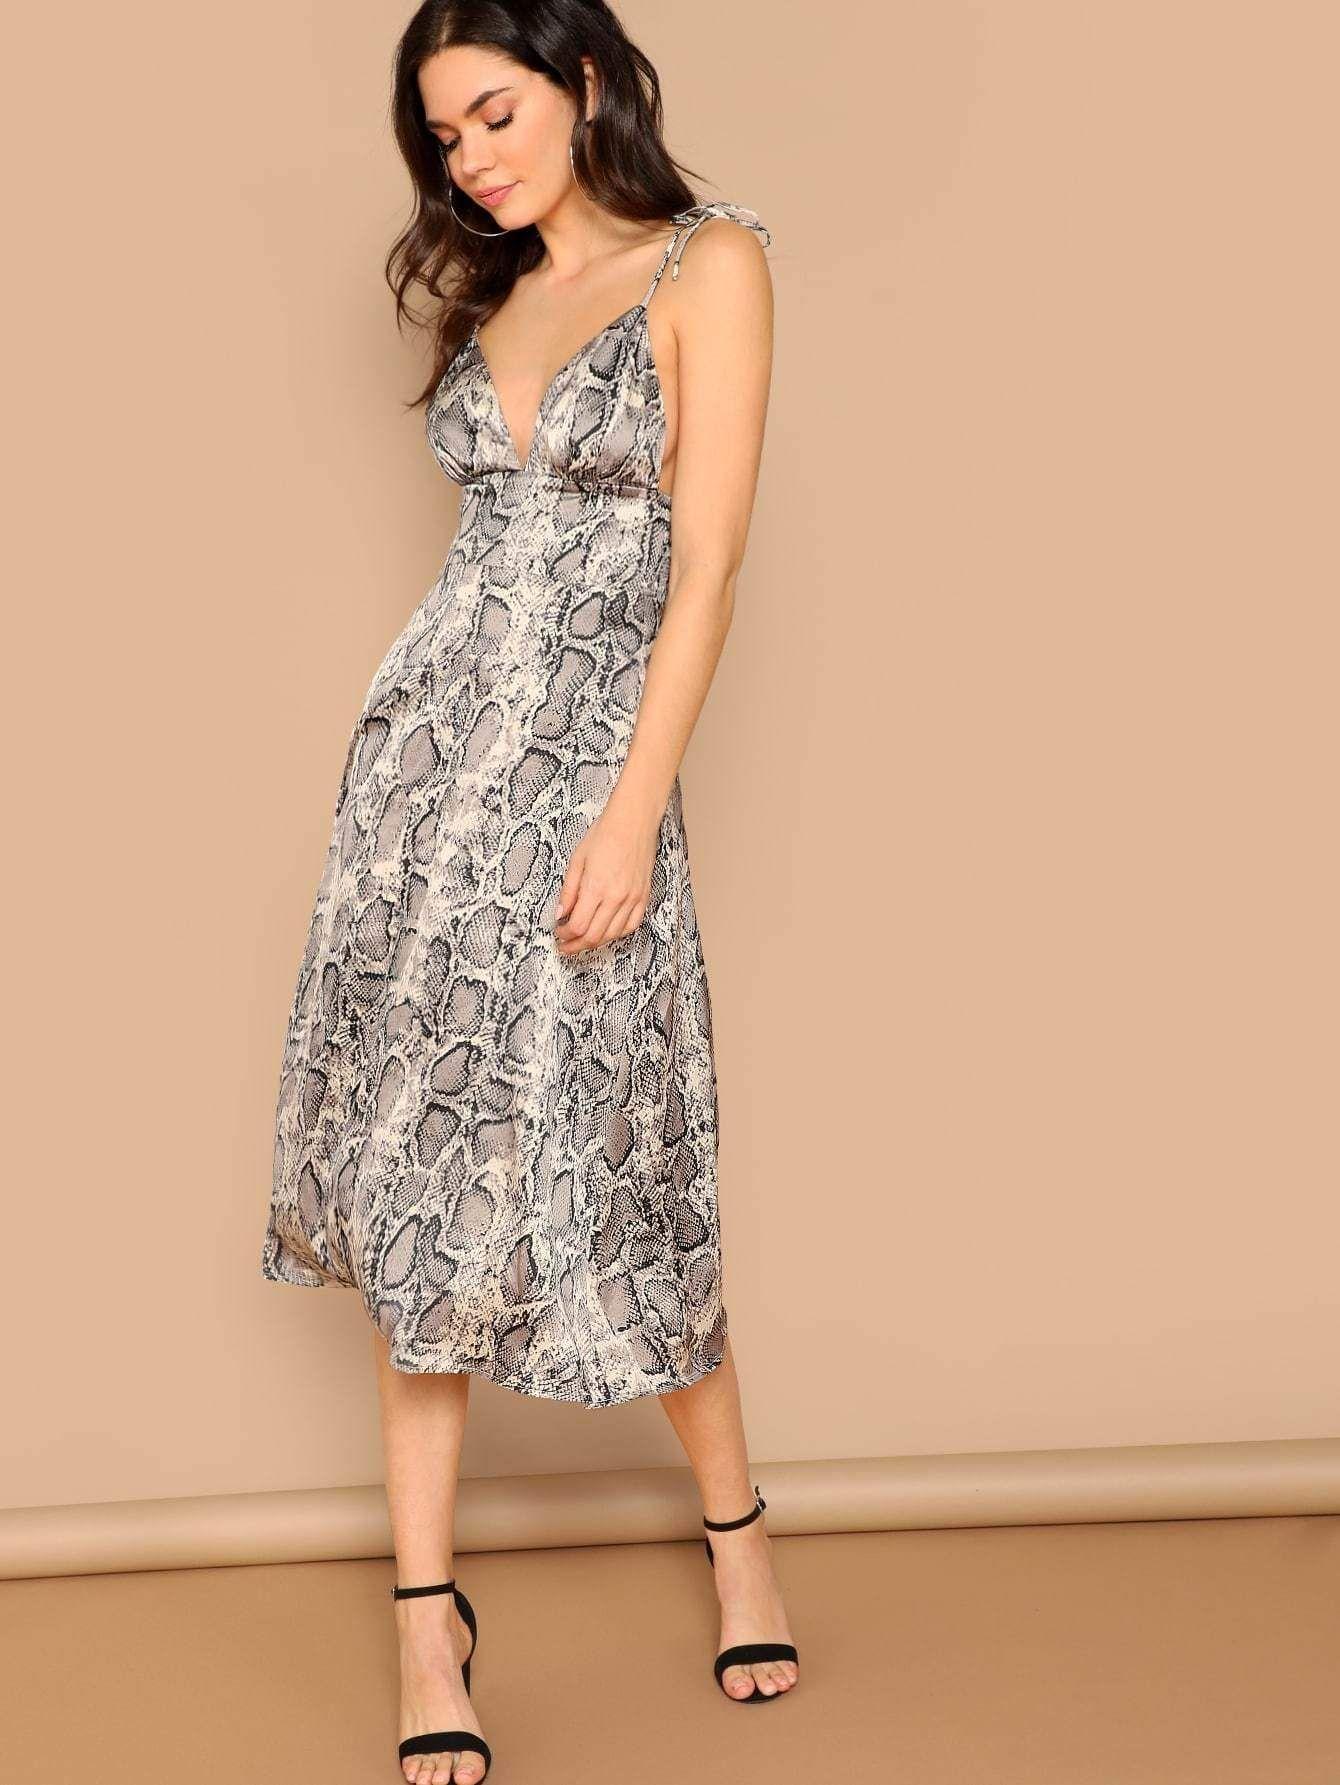 de5ee65f347f Deep V Neck Snakeskin Slip Going Out Midi Dress - Popviva #summer #year  #fall #spring #season #winter #daylight #summertime #vacations #holiday  #autumn ...